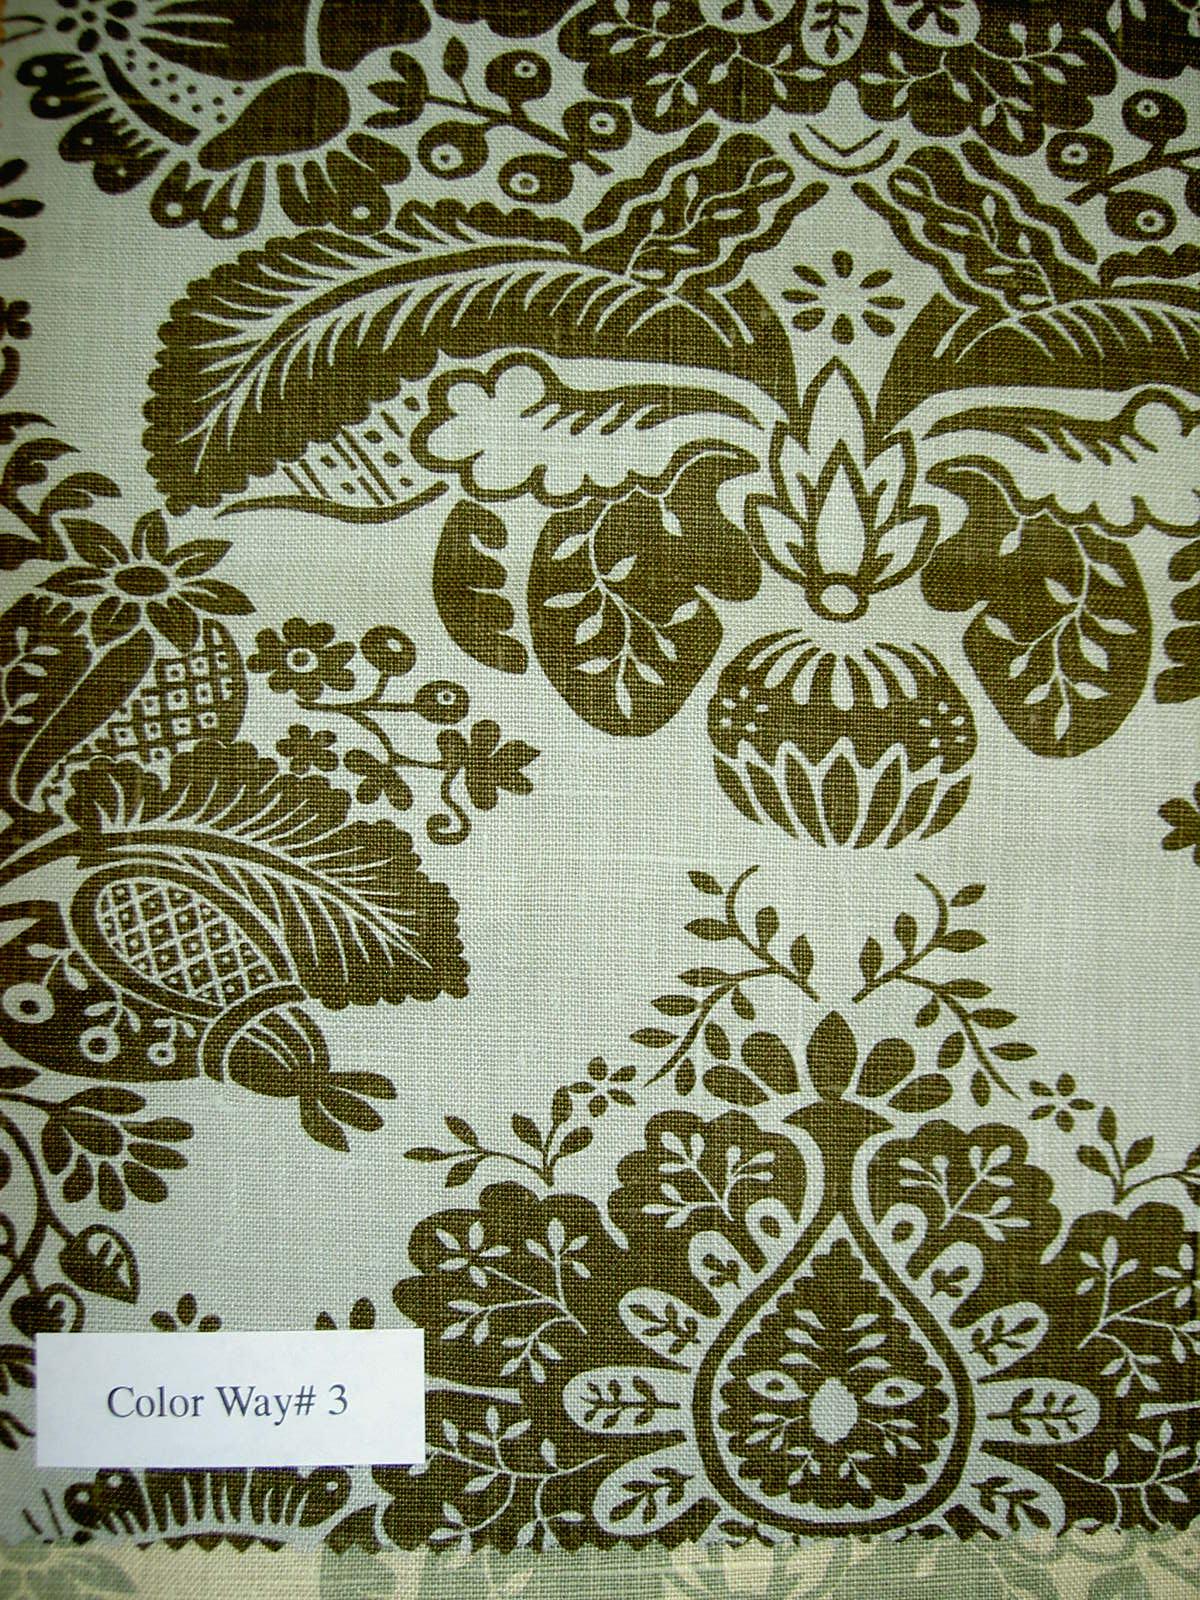 Pin by kerrin naeff on la belle poque pinterest - Home decor designer fabric ...